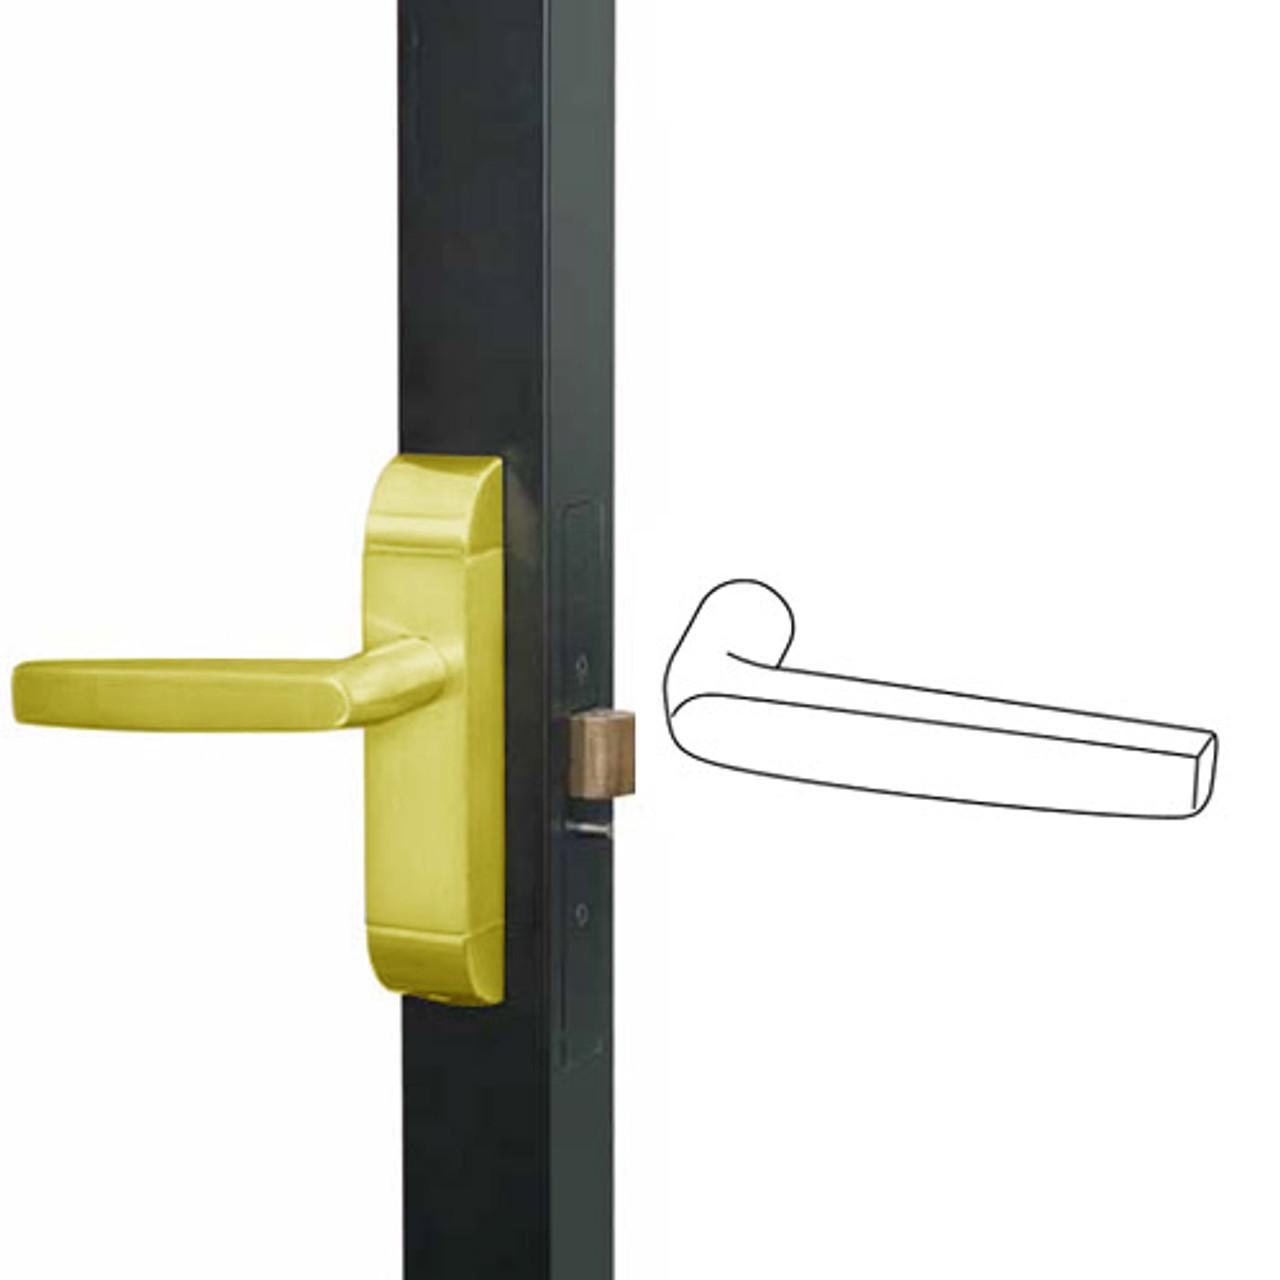 4600-MJ-612-US3 Adams Rite MJ Designer Deadlatch handle in Bright Brass Finish